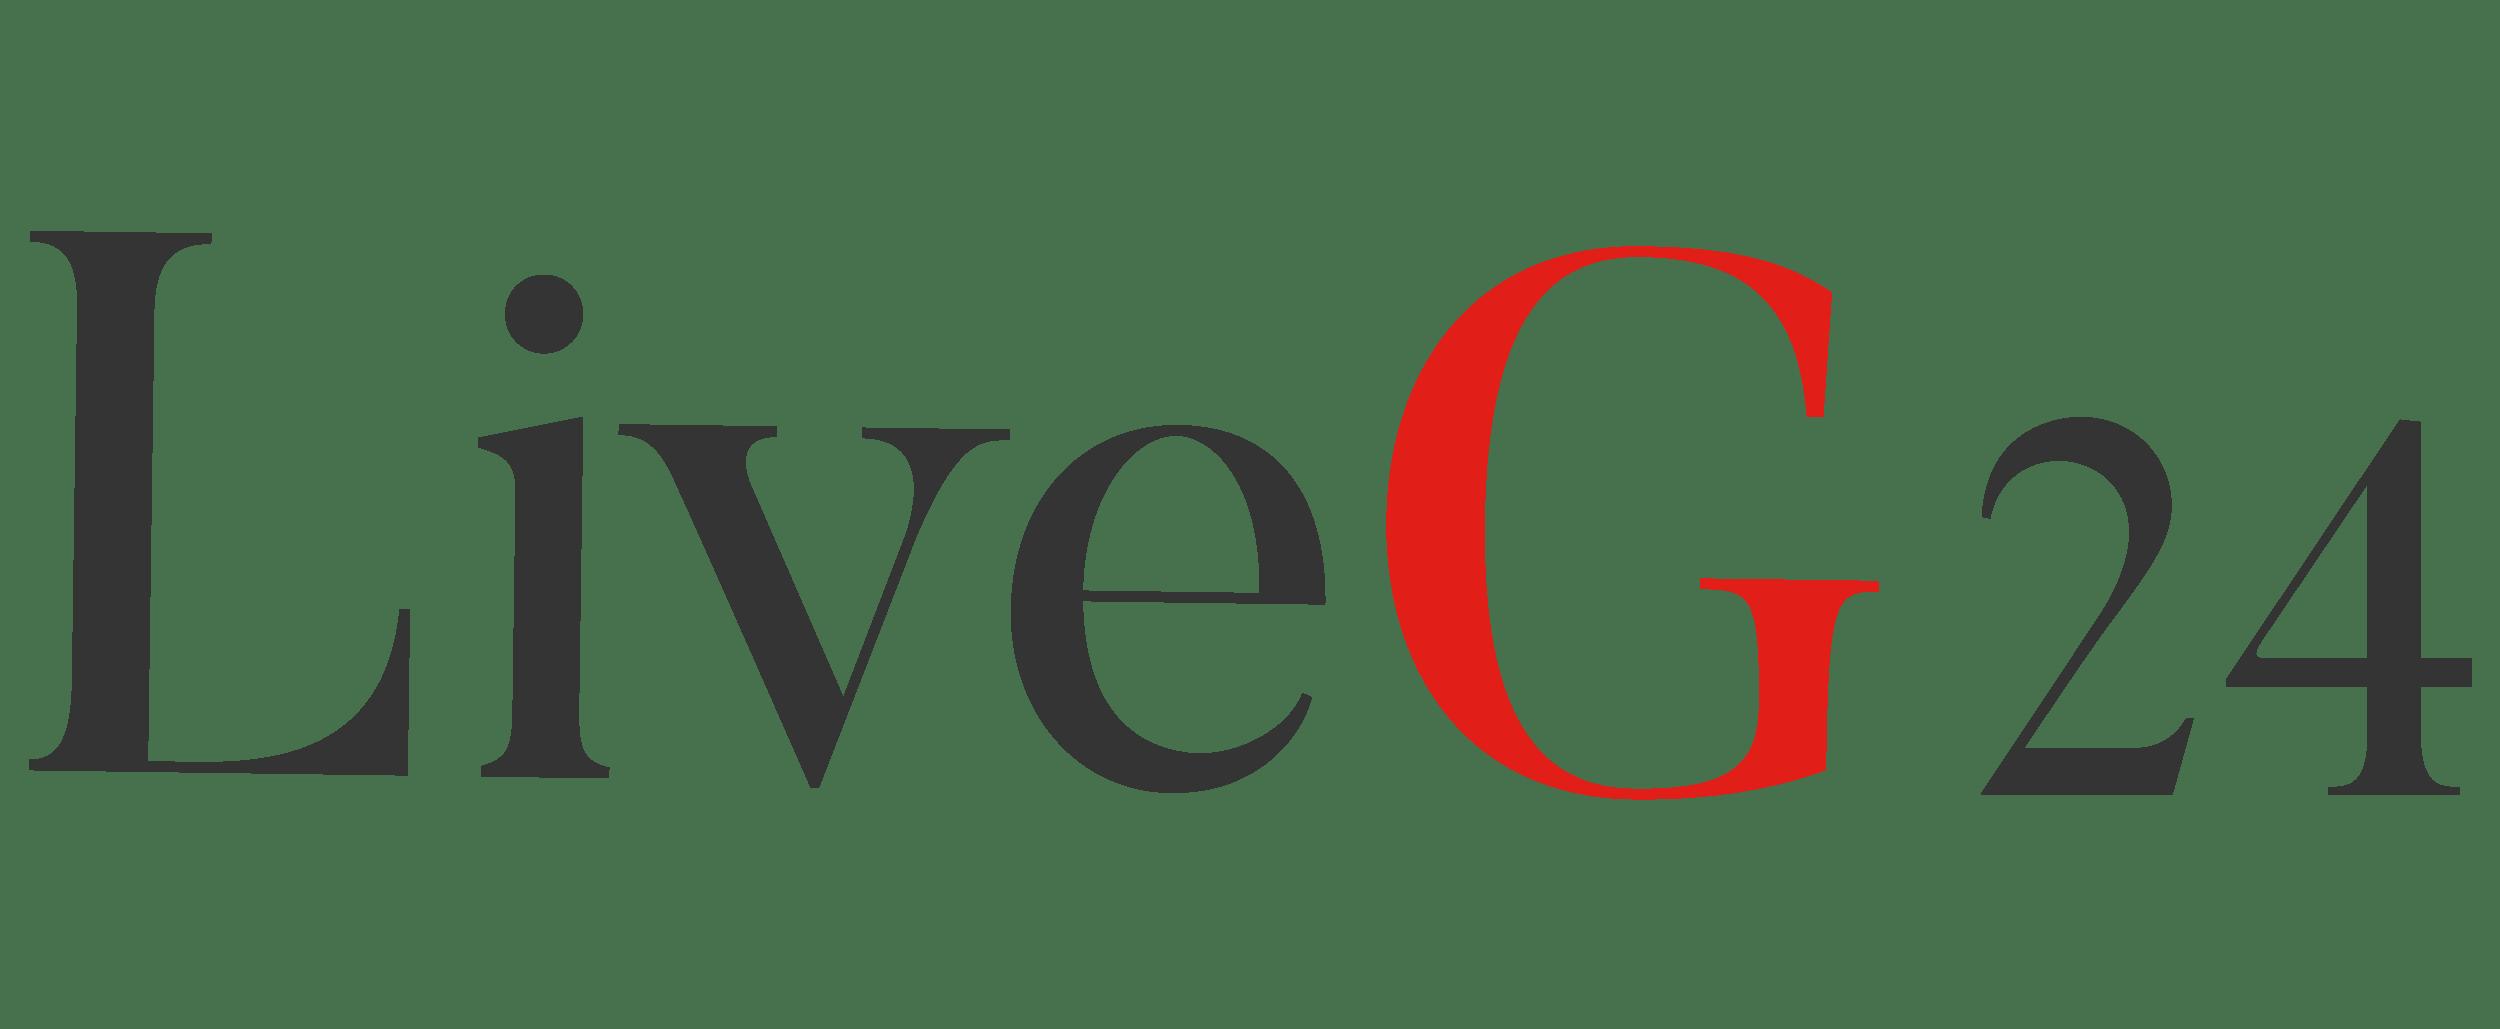 LiveG24 (formerly Medialive Casino) games